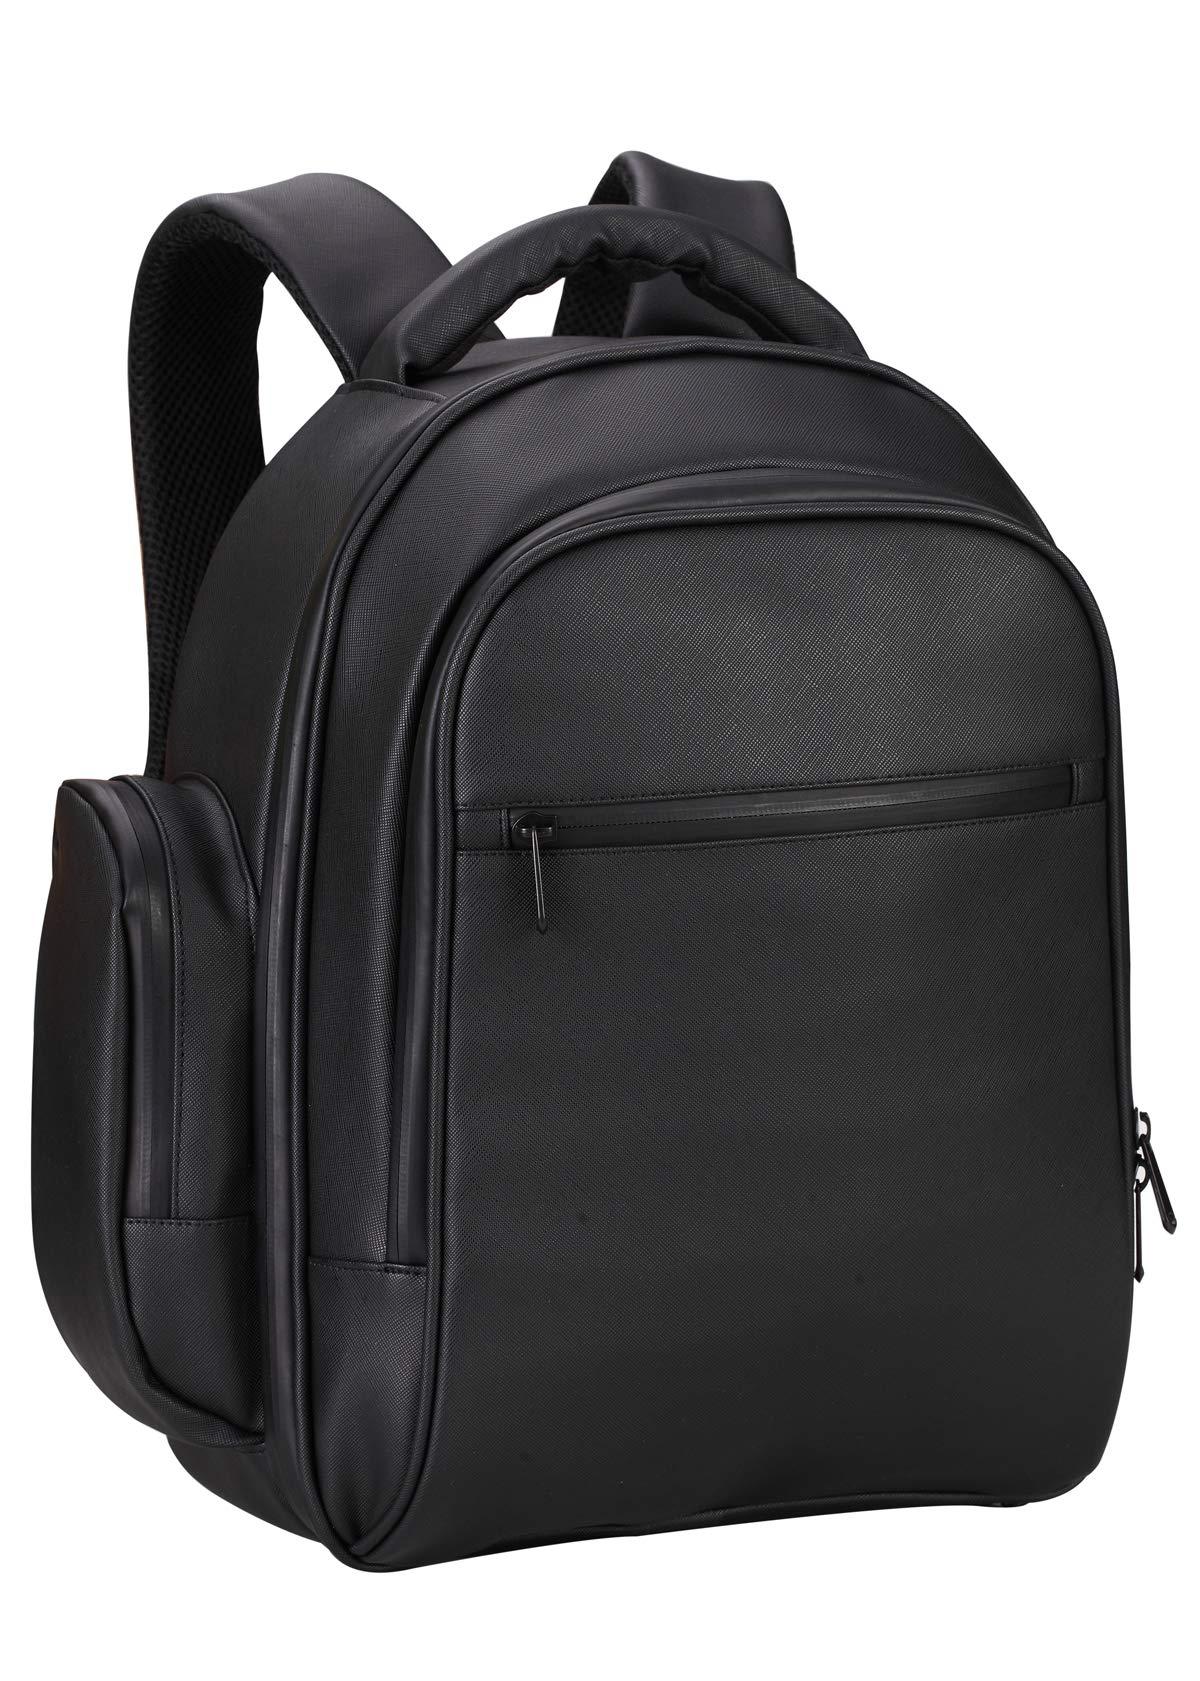 Qualitell Mavic 2 Backpack Waterproof Shoulder Bag Travel Backpack for DJI Mavic 2 Pro/ Zoom       by Qualitell